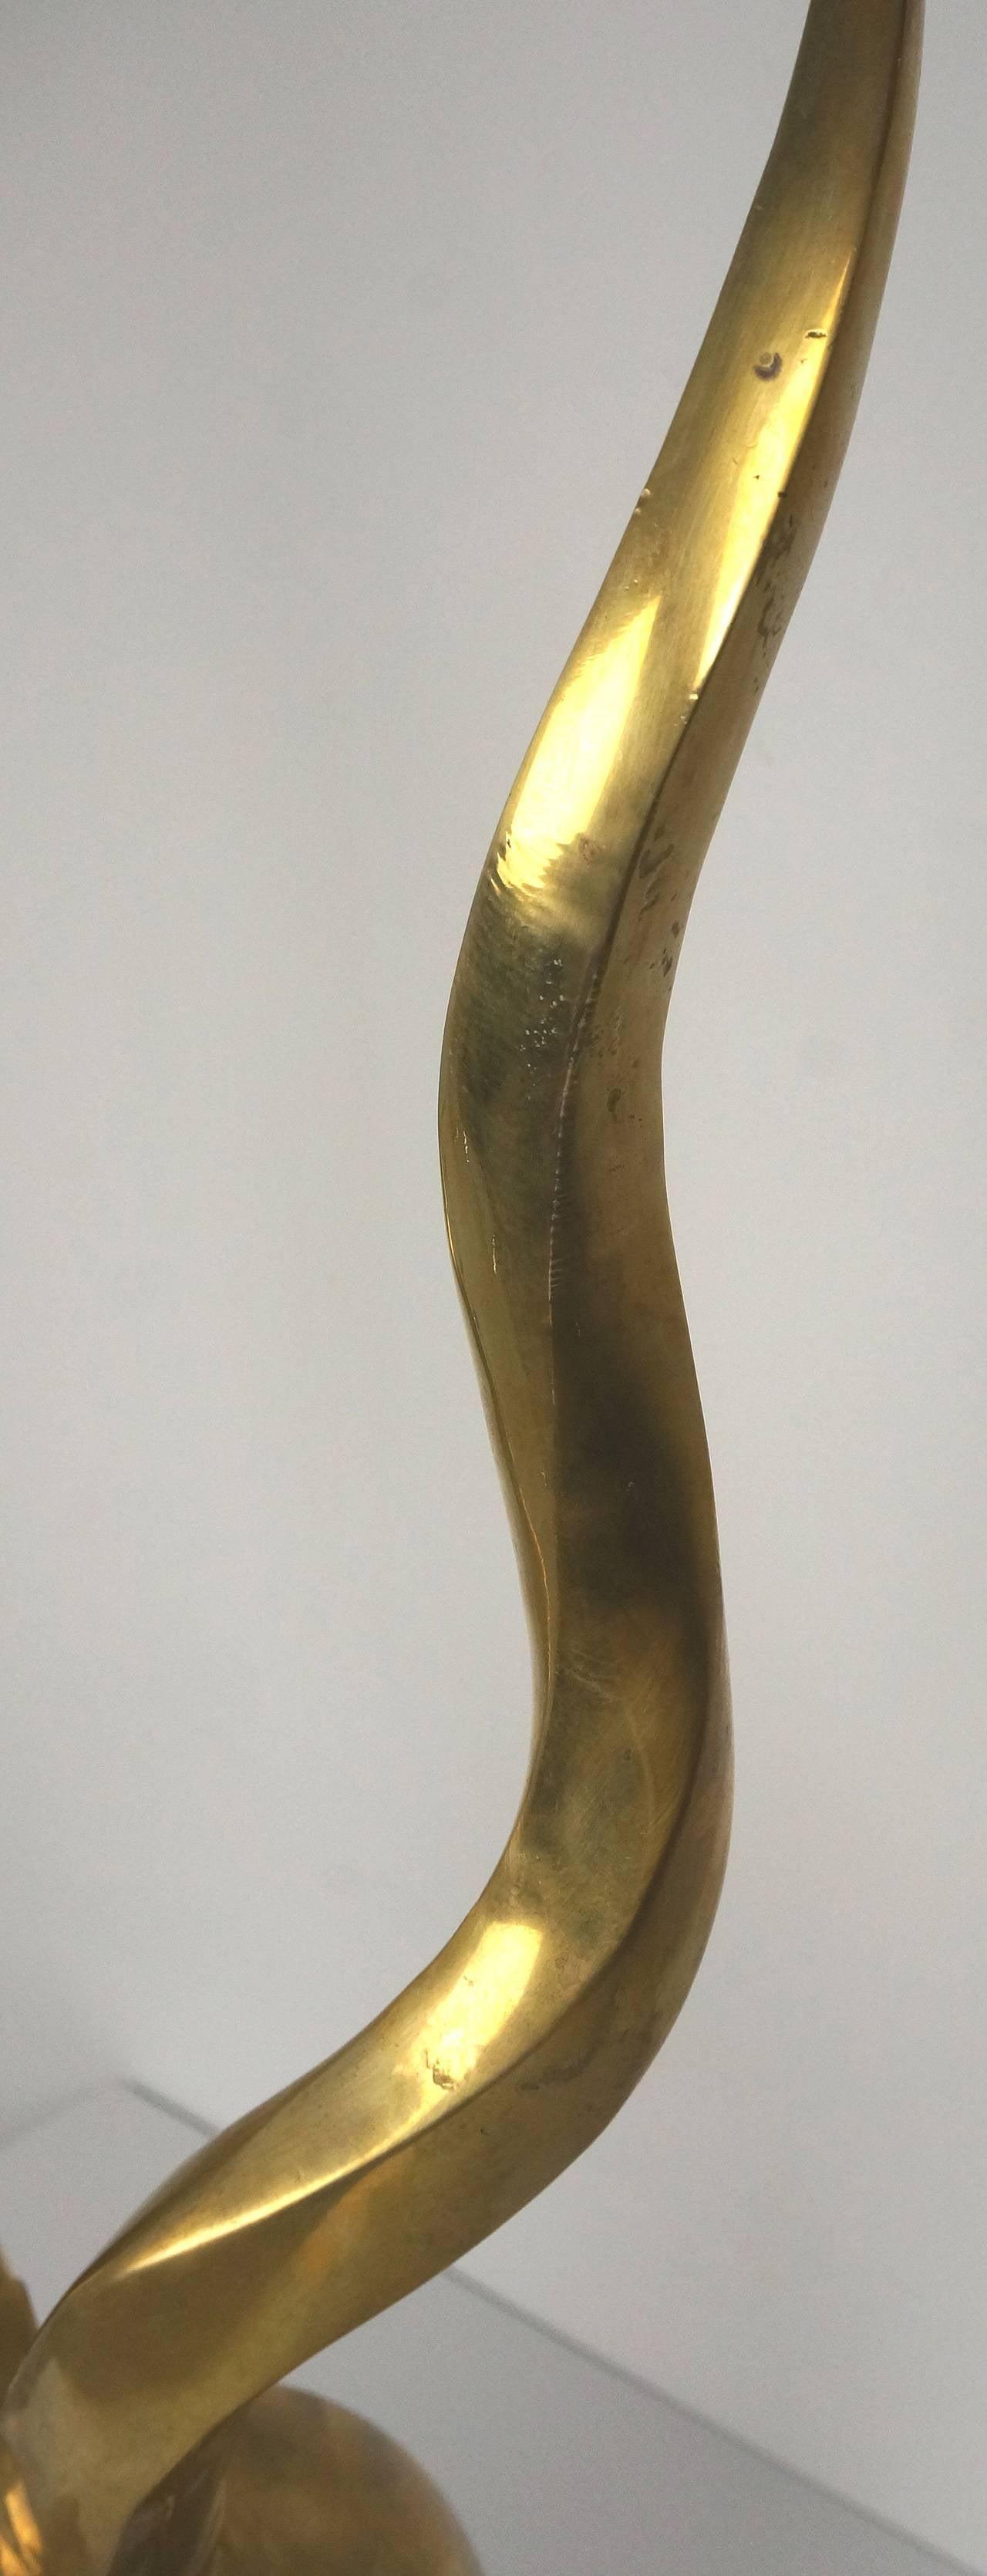 Art Deco Style Sculpture of a Gazelle / Antelope in Cast Brass, Mid-Century 4